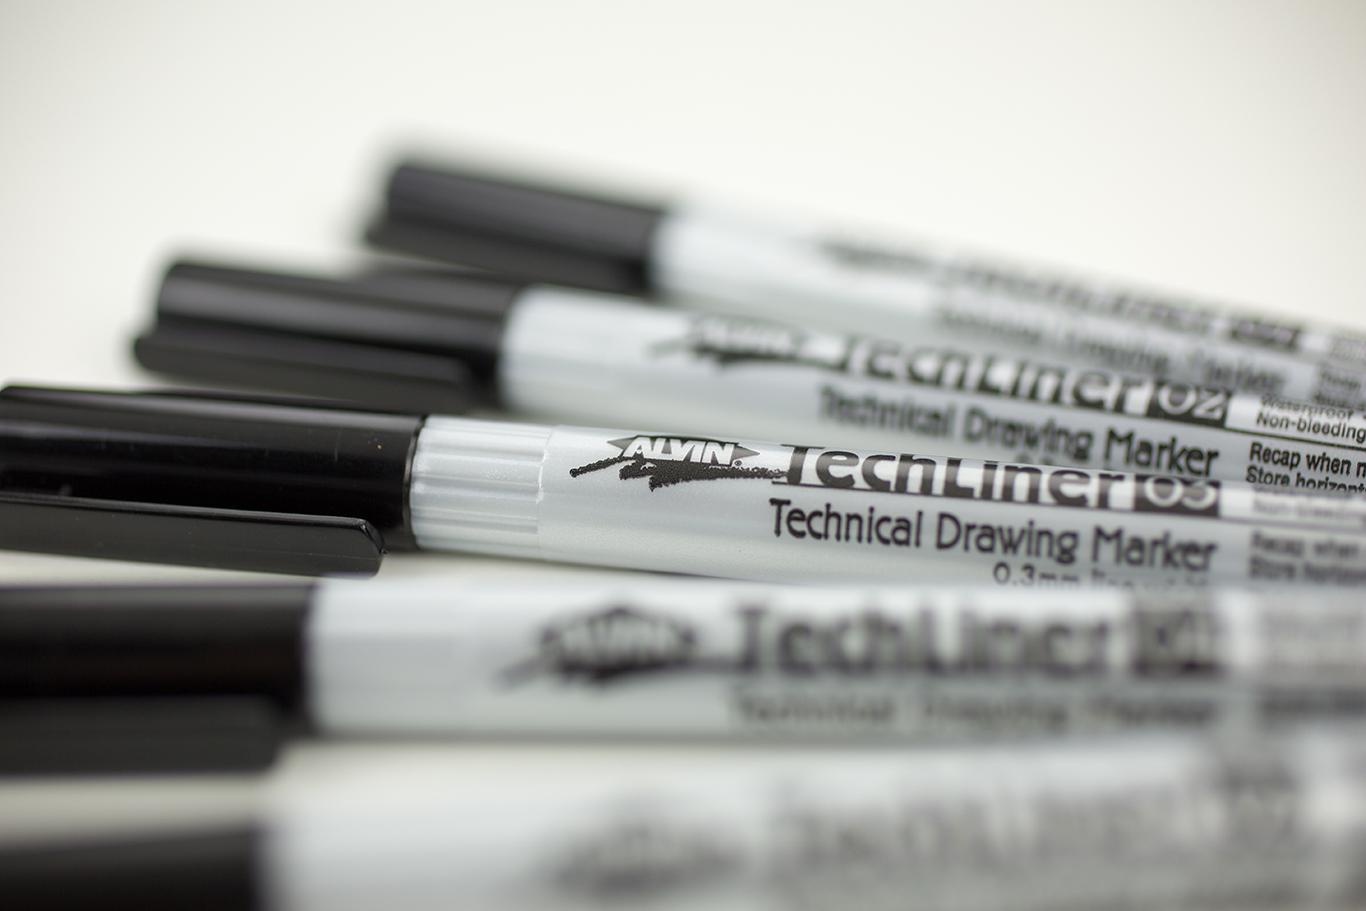 Alvin® TechLiner Technical Drawing Marker 5-Piece Set Item No. TLP5